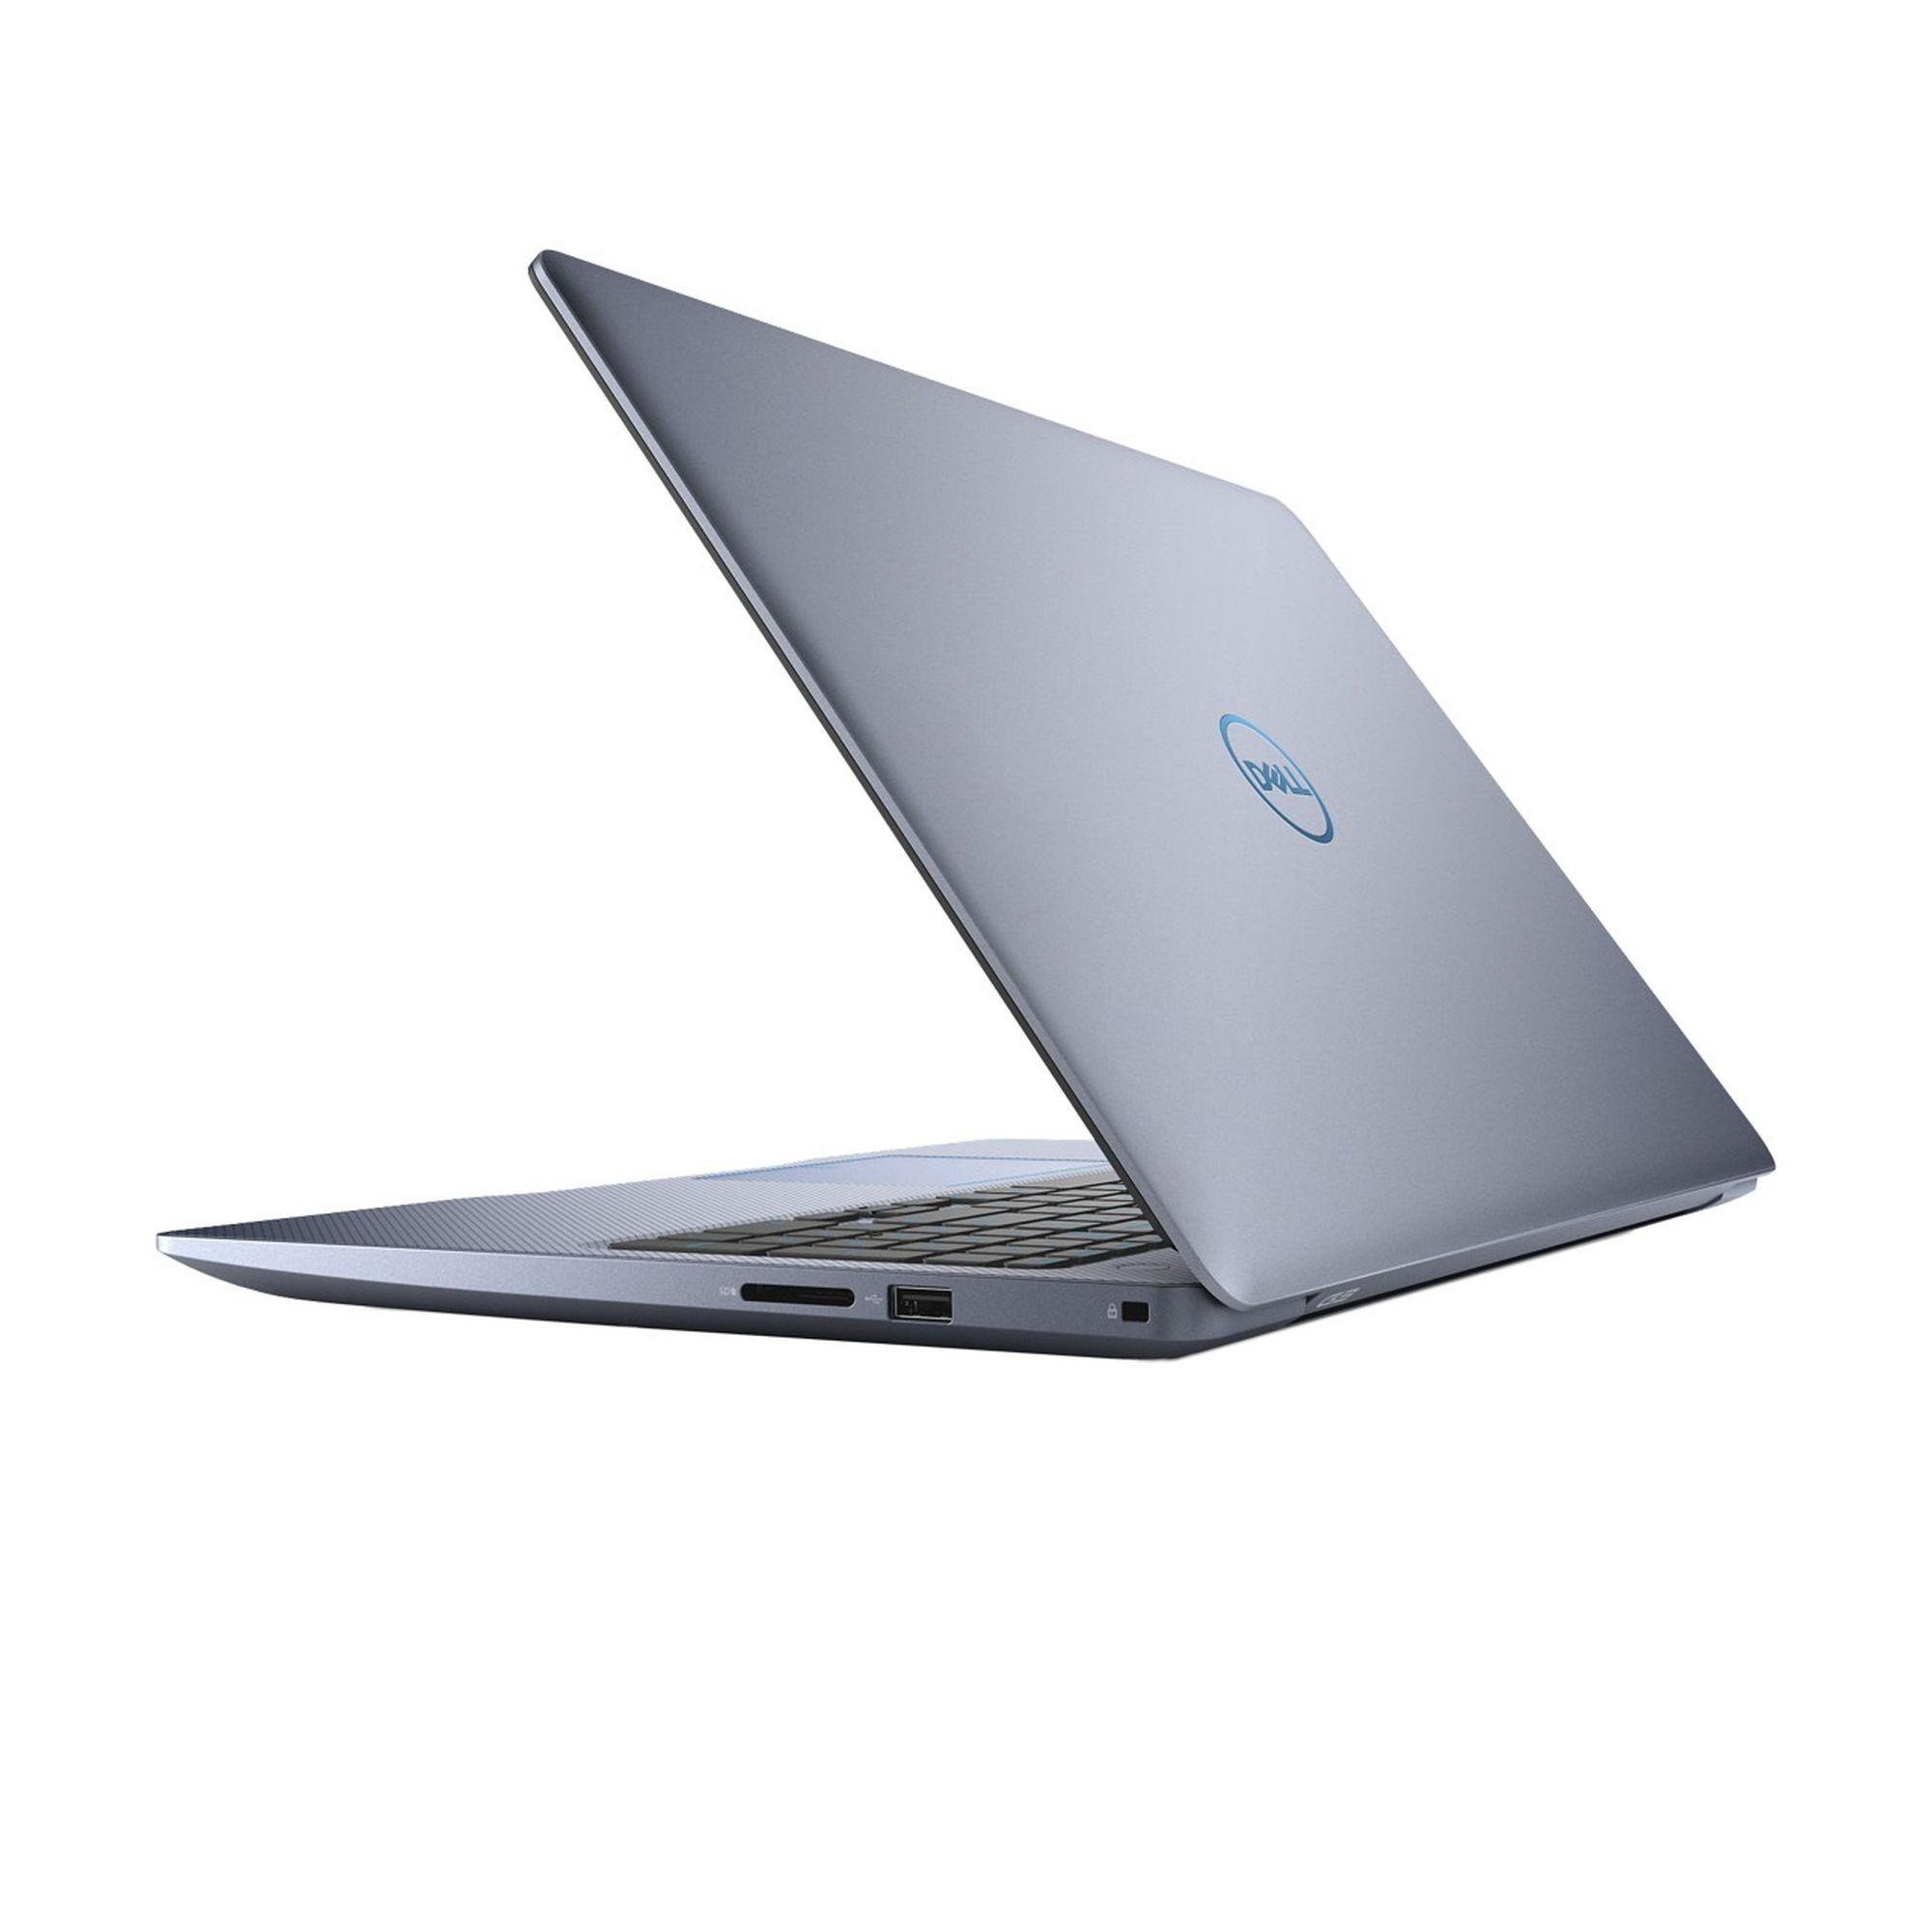 Dell Inspiron G3 3579 15 FHD i7-8750H/8GB/128 SSD+1TB/Ti 1050-4GB/USB-C/MCR/FPR/HDMI/W10/2RNBD/Modrý